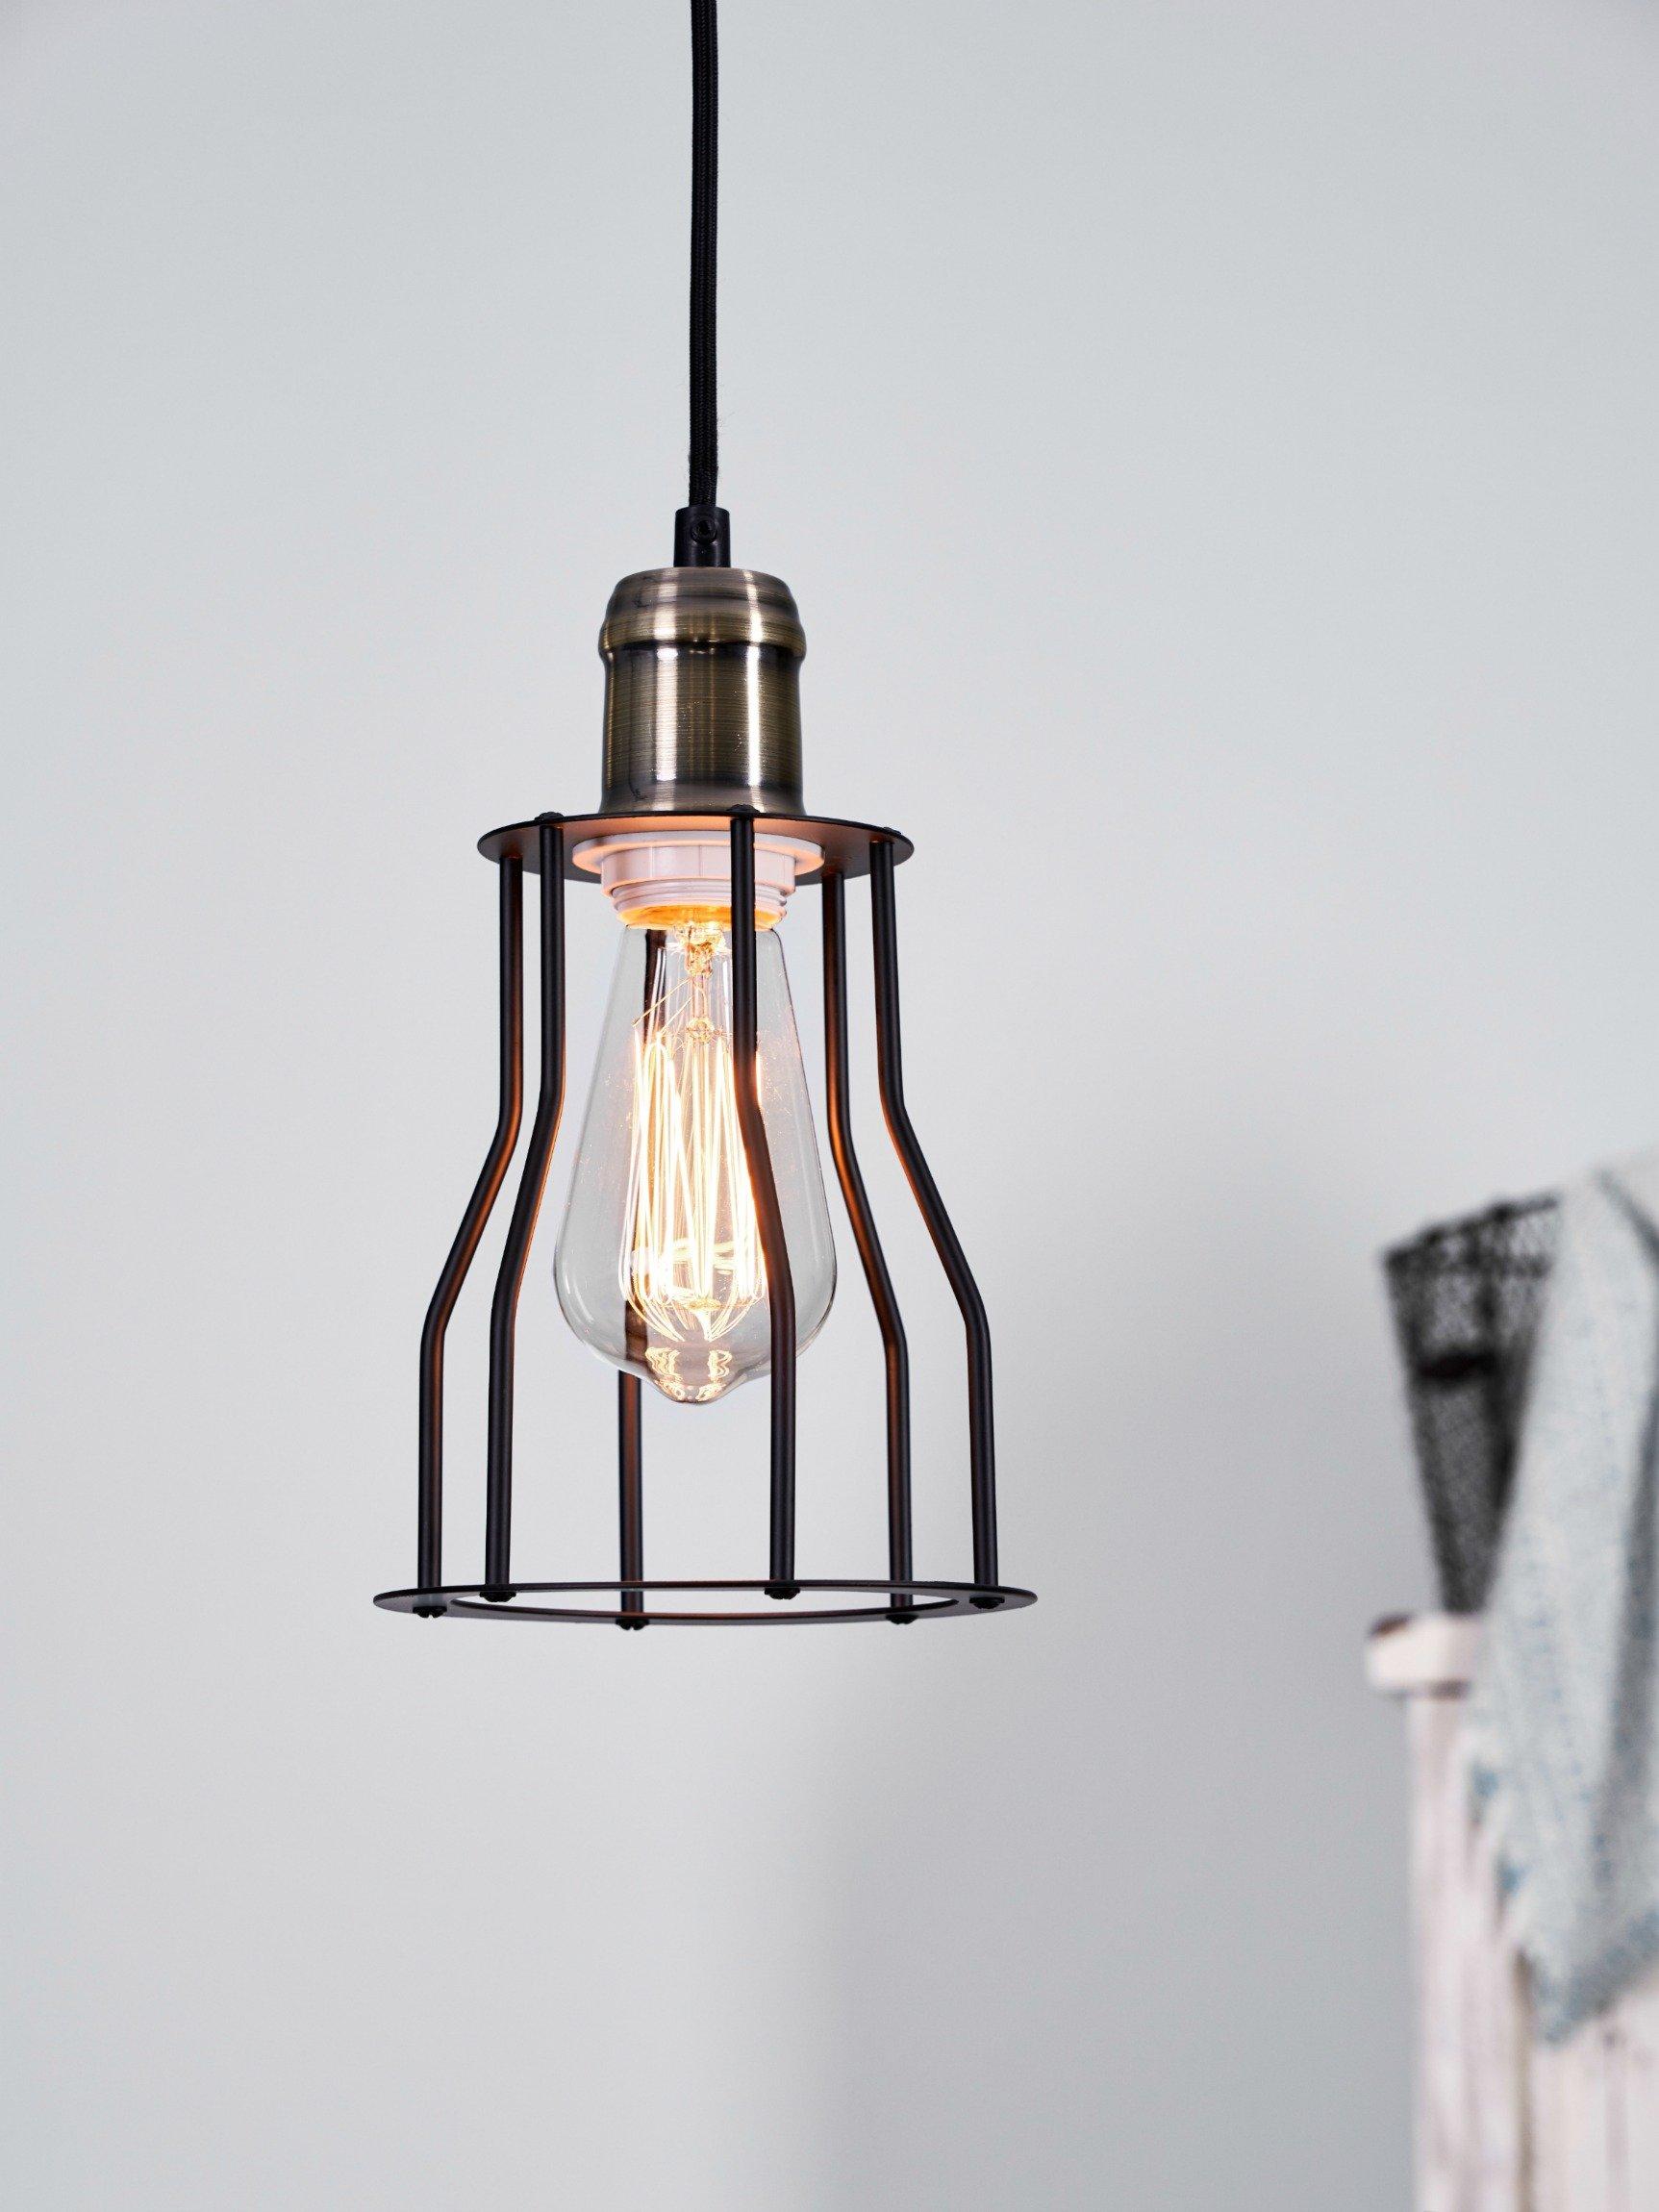 Get Quotations · LightLady Studio   Industrial Mini Pendant Light   Cage  Pendant Light For A Vintage Look